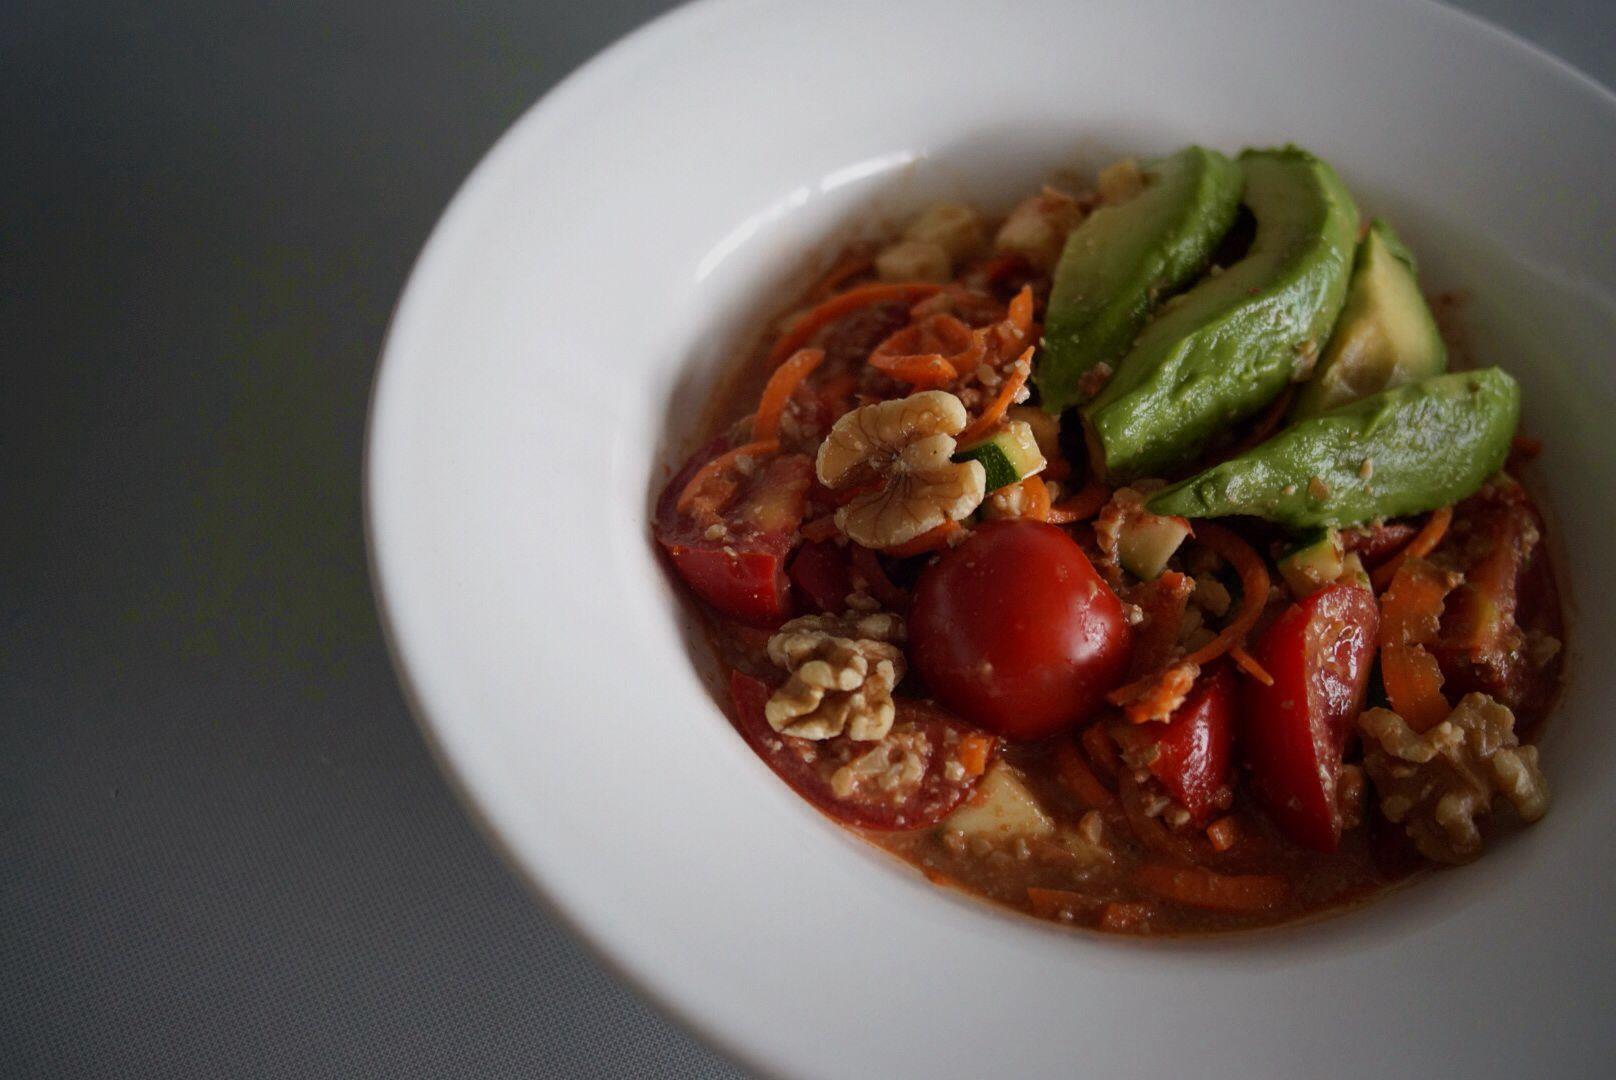 Raw chili sin carne #vegan # healthfood